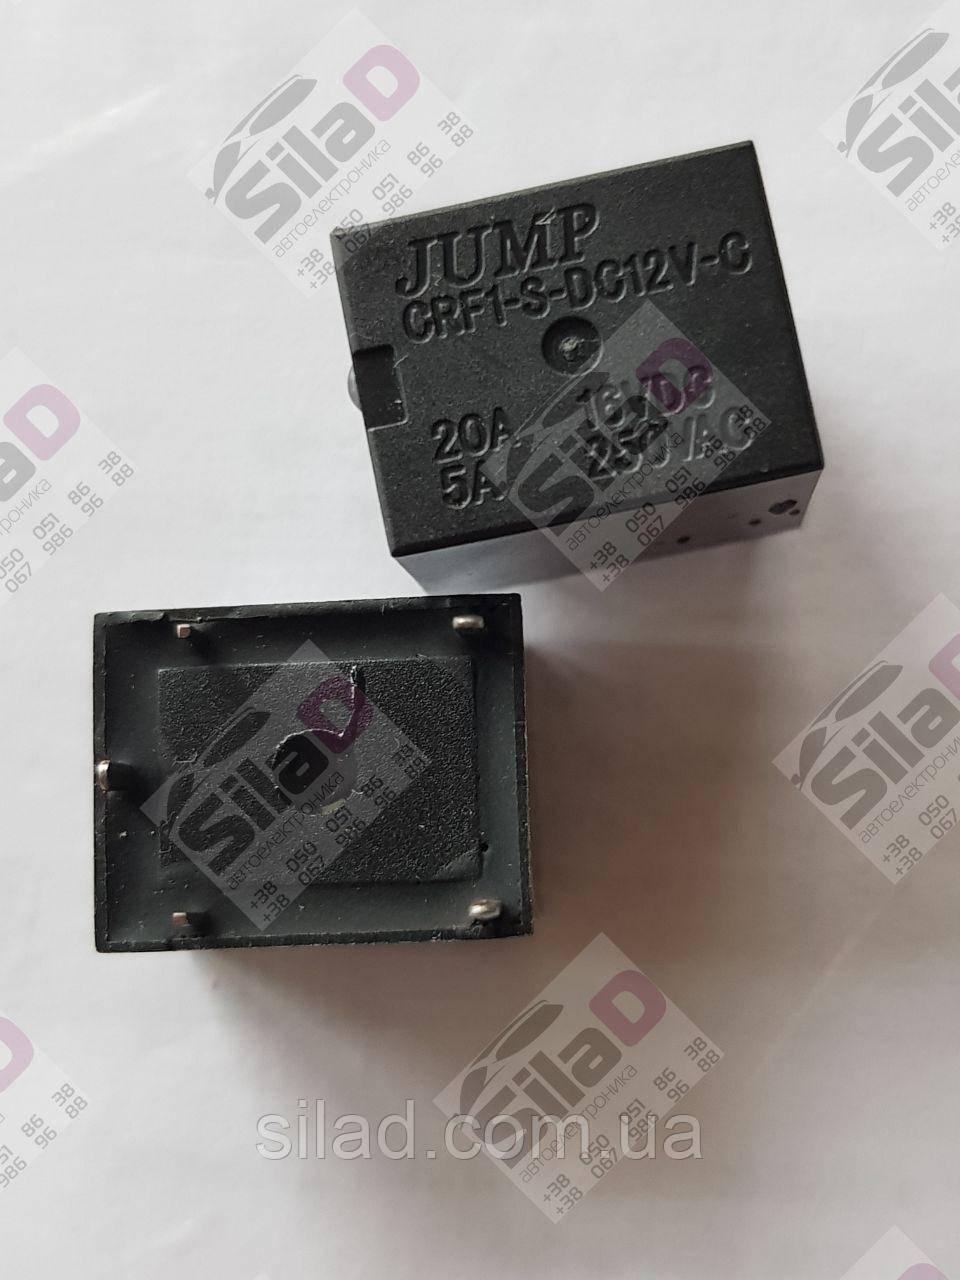 Реле CRF1-S-DC12V-C JUMP корпус Pin5